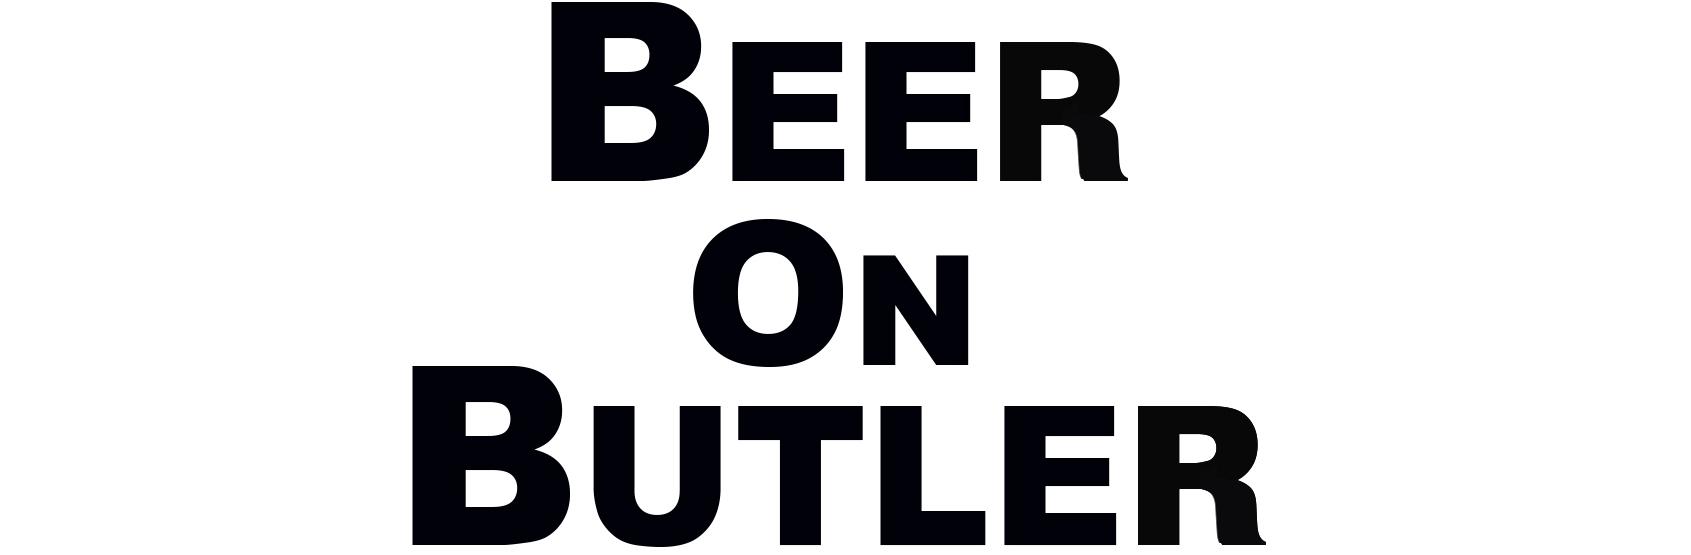 Beer On Butler-WIDE.jpg